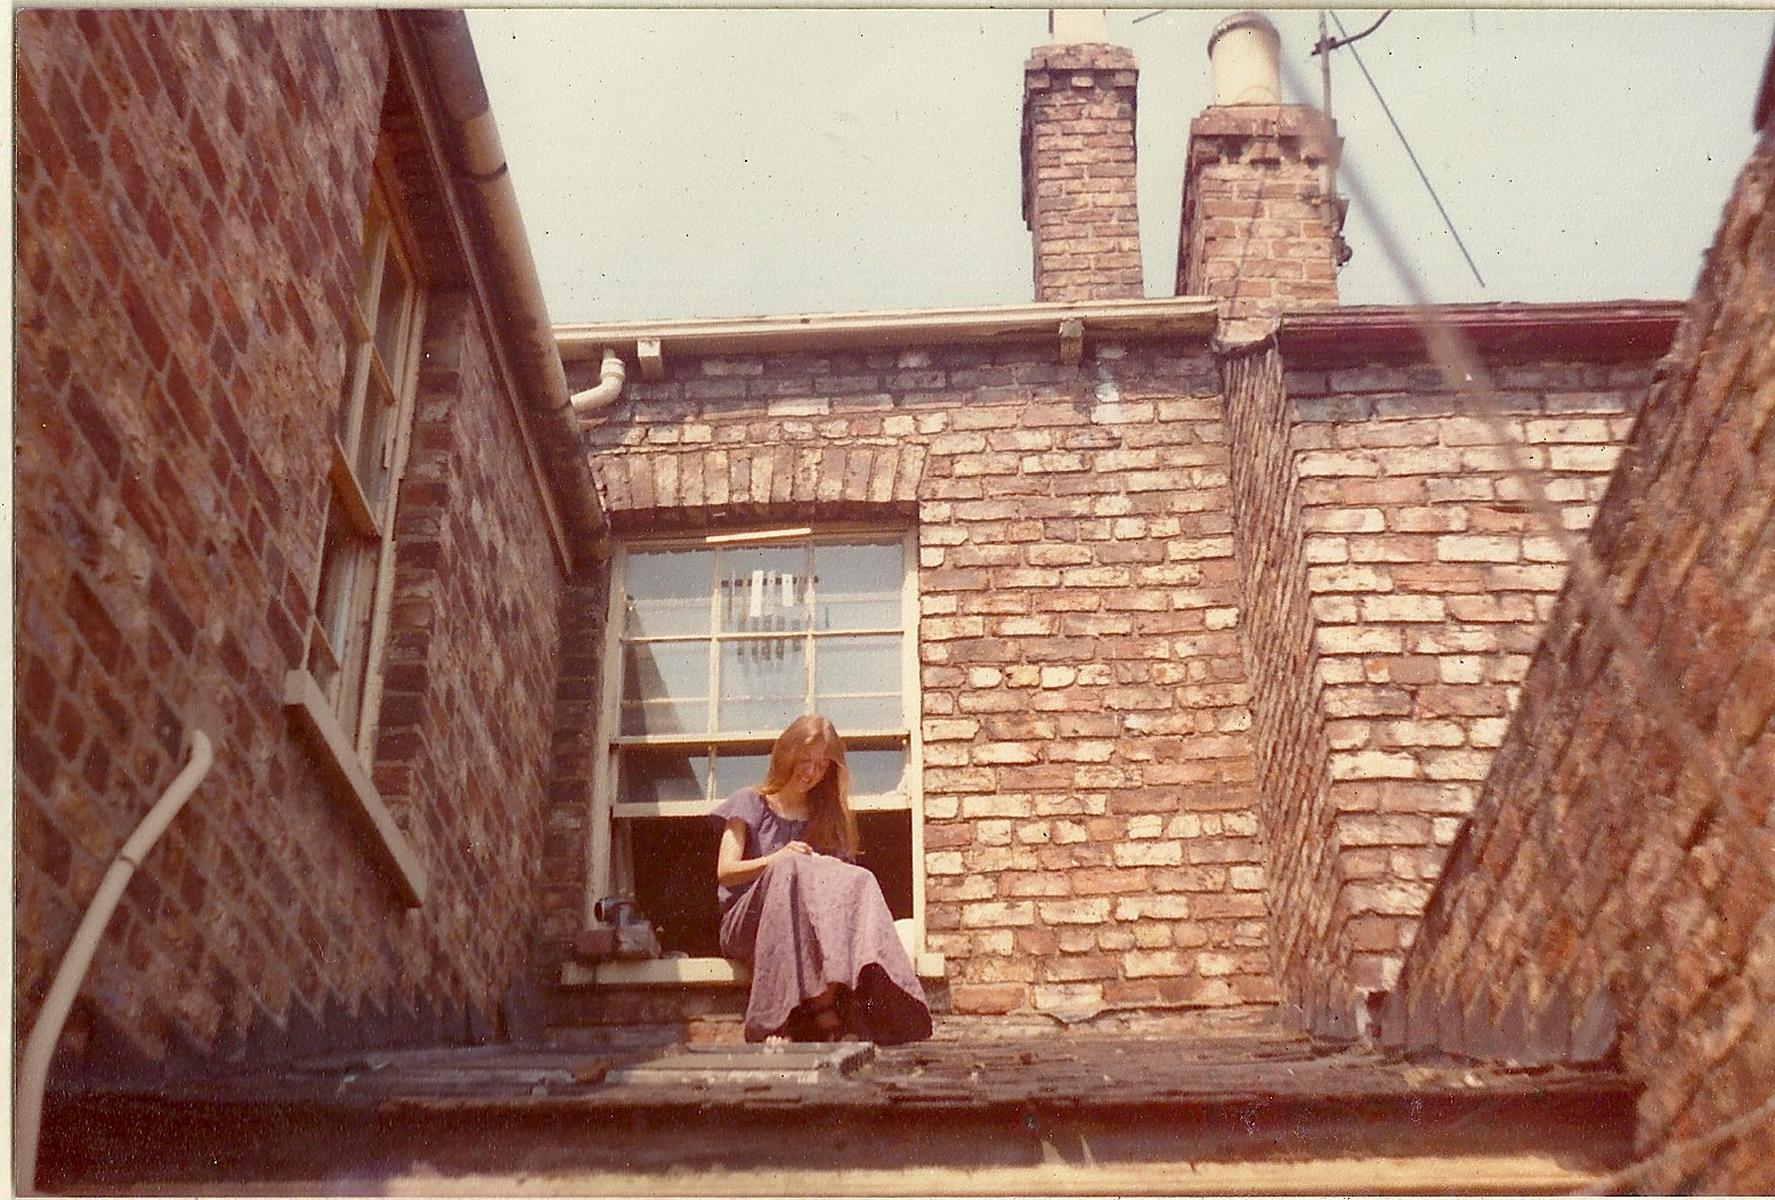 JAMES ST DOROTHY 1976 1